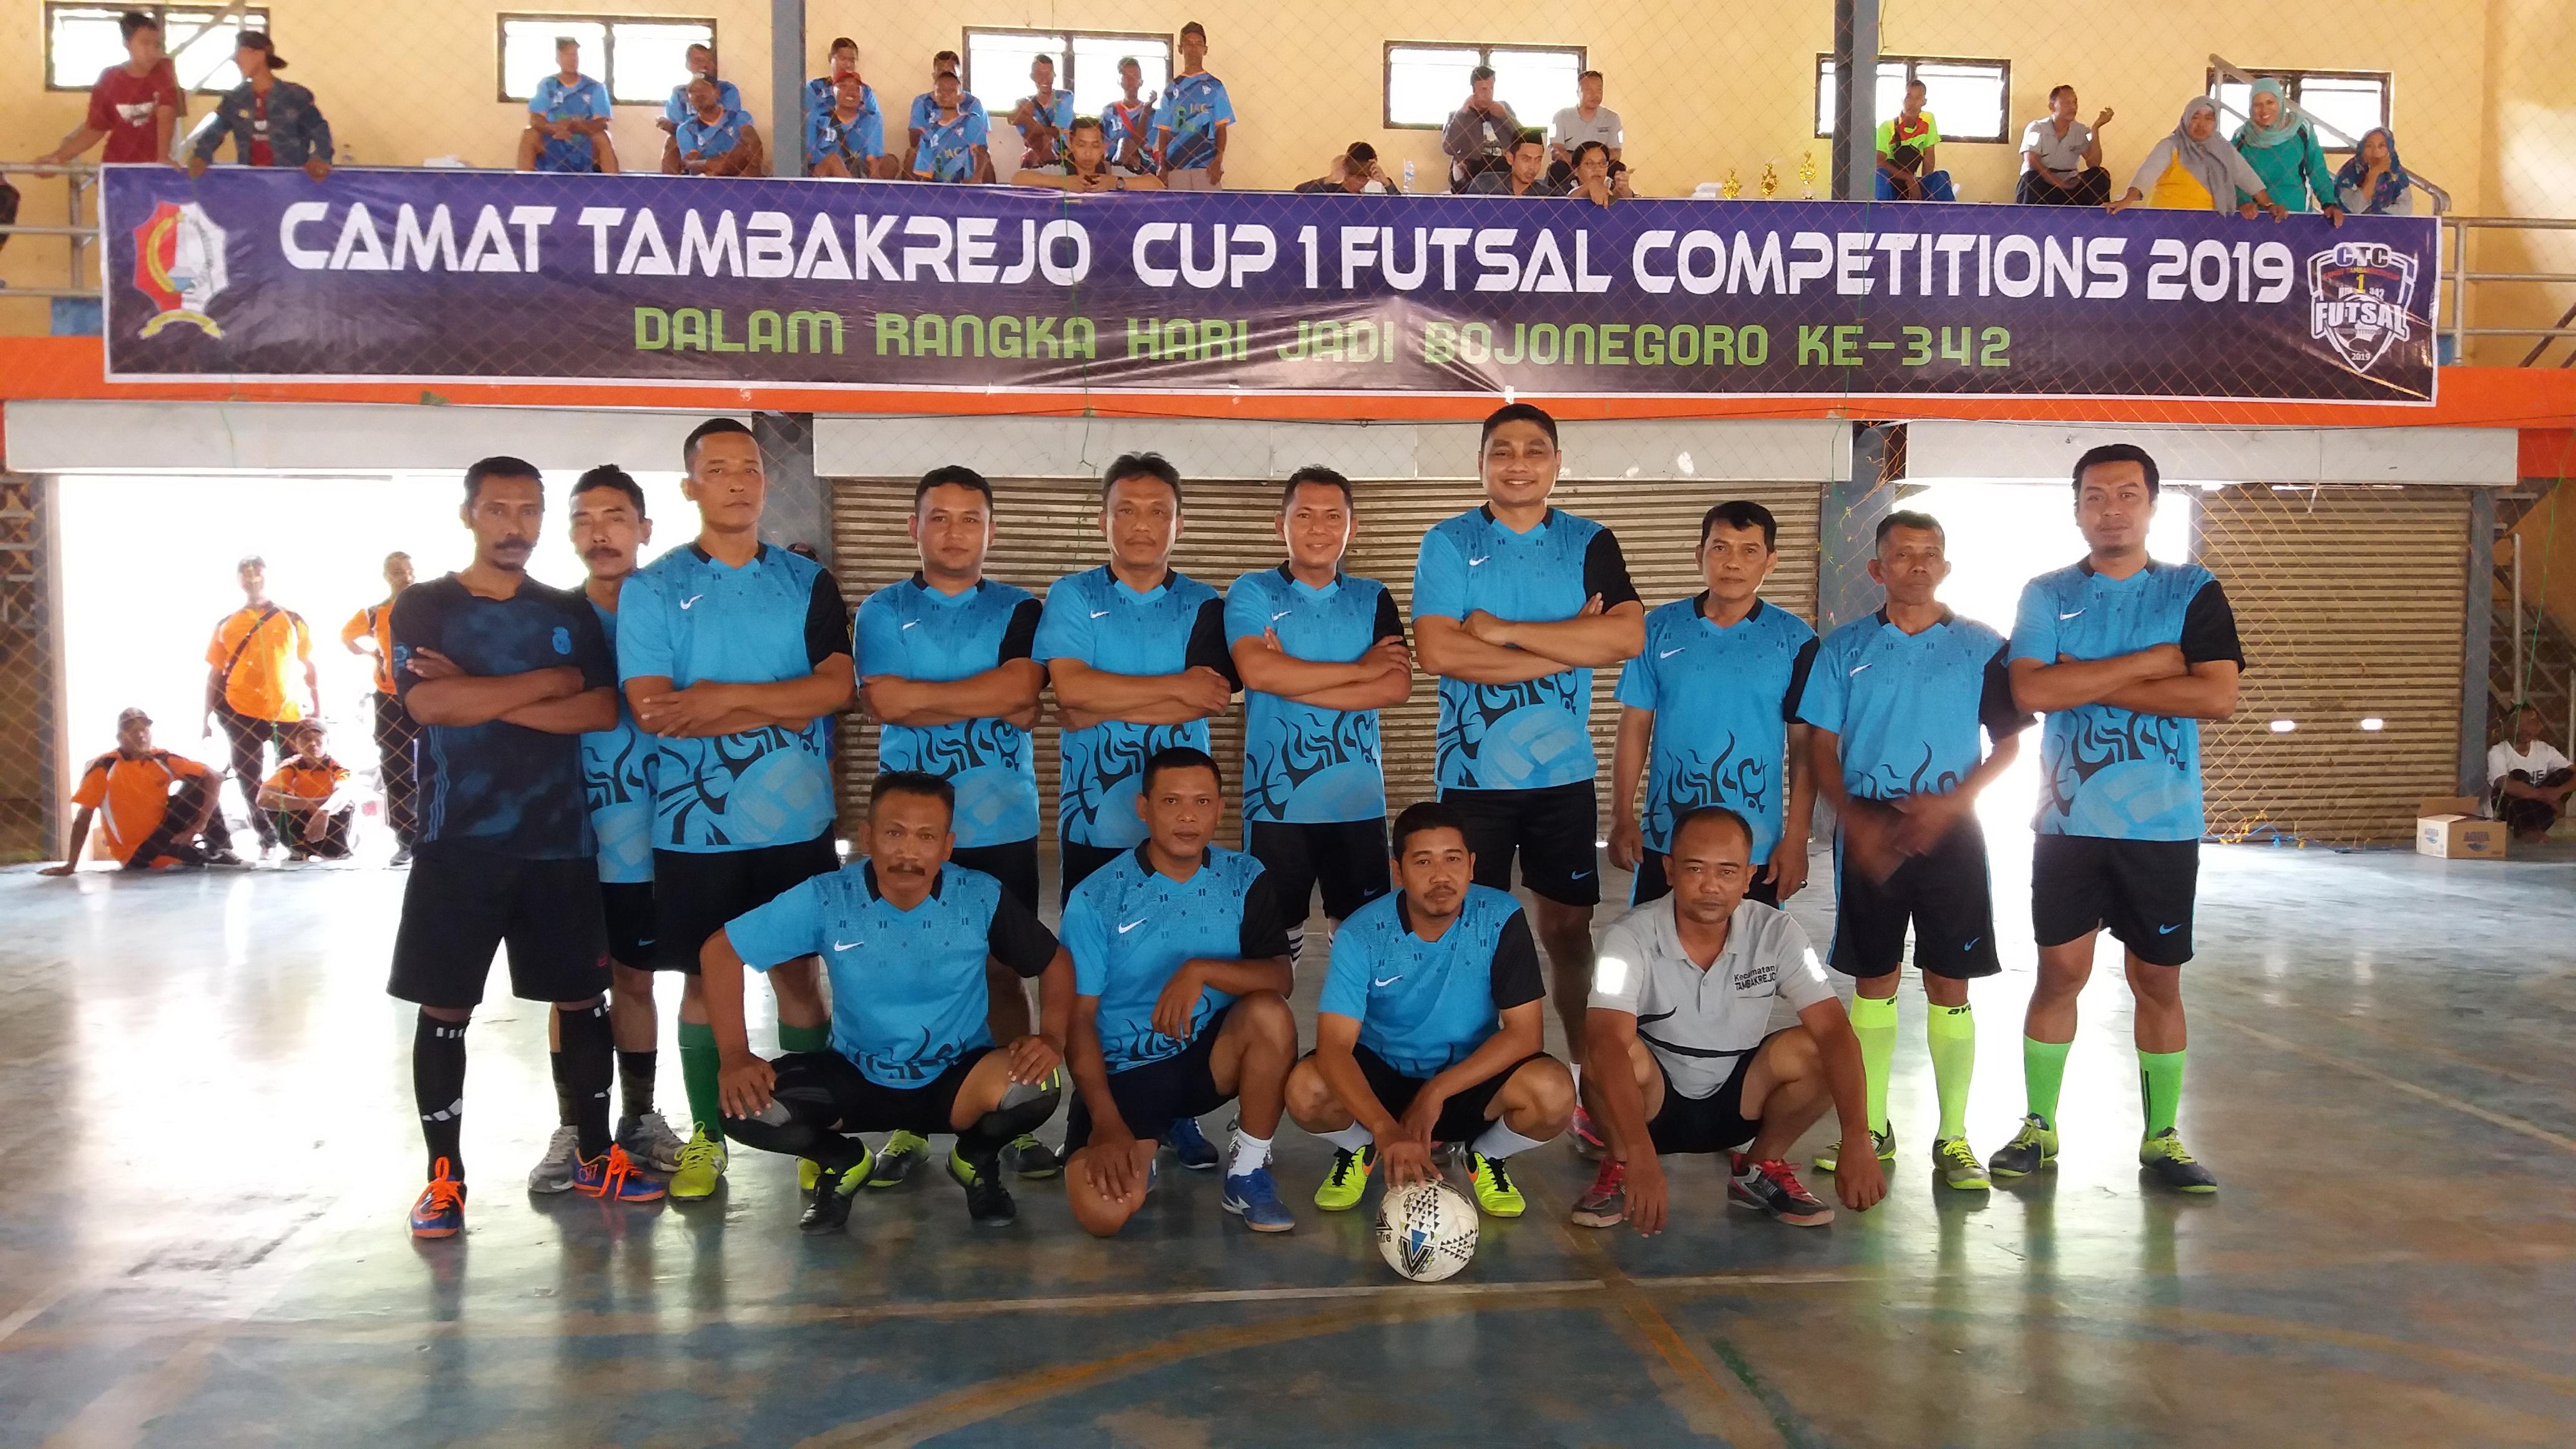 CAMAT TAMBAKREJO CUP I FUTSAL COMPETITIONS 2019<BR>KECAMATAN TAMBAKREJO